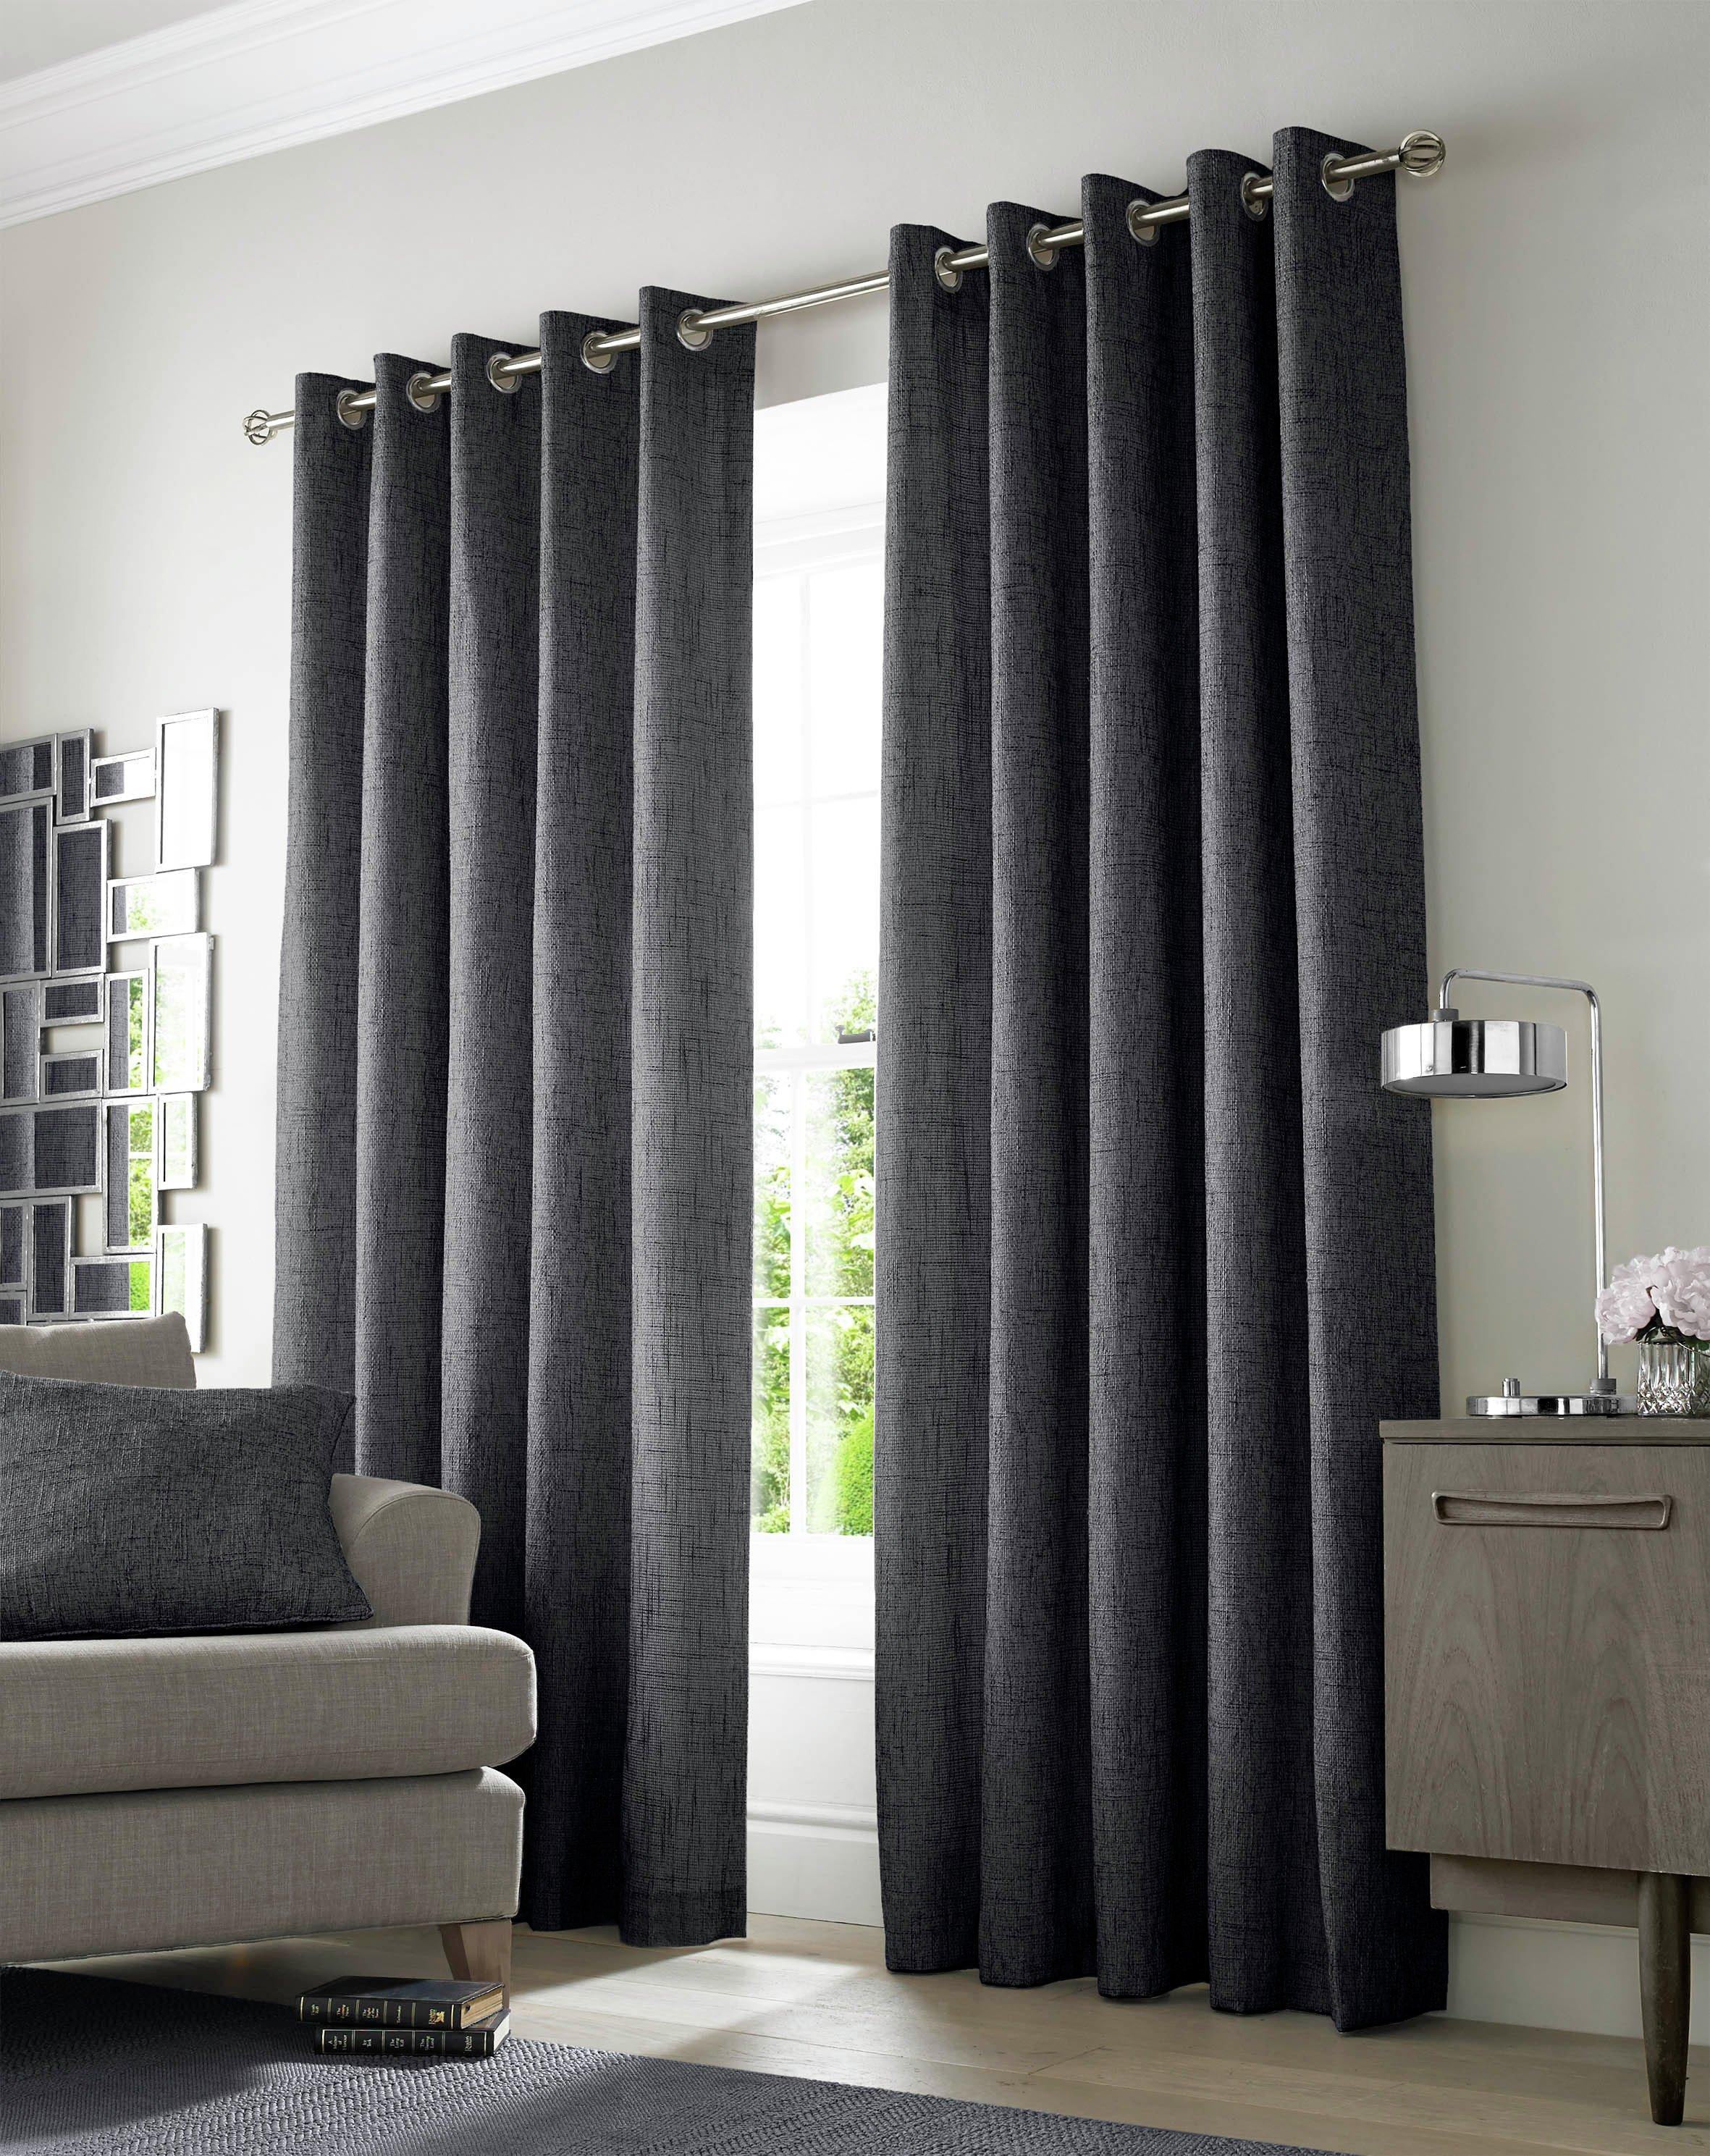 Academy Eyelet Curtains - 229x229cm - Charcoal.